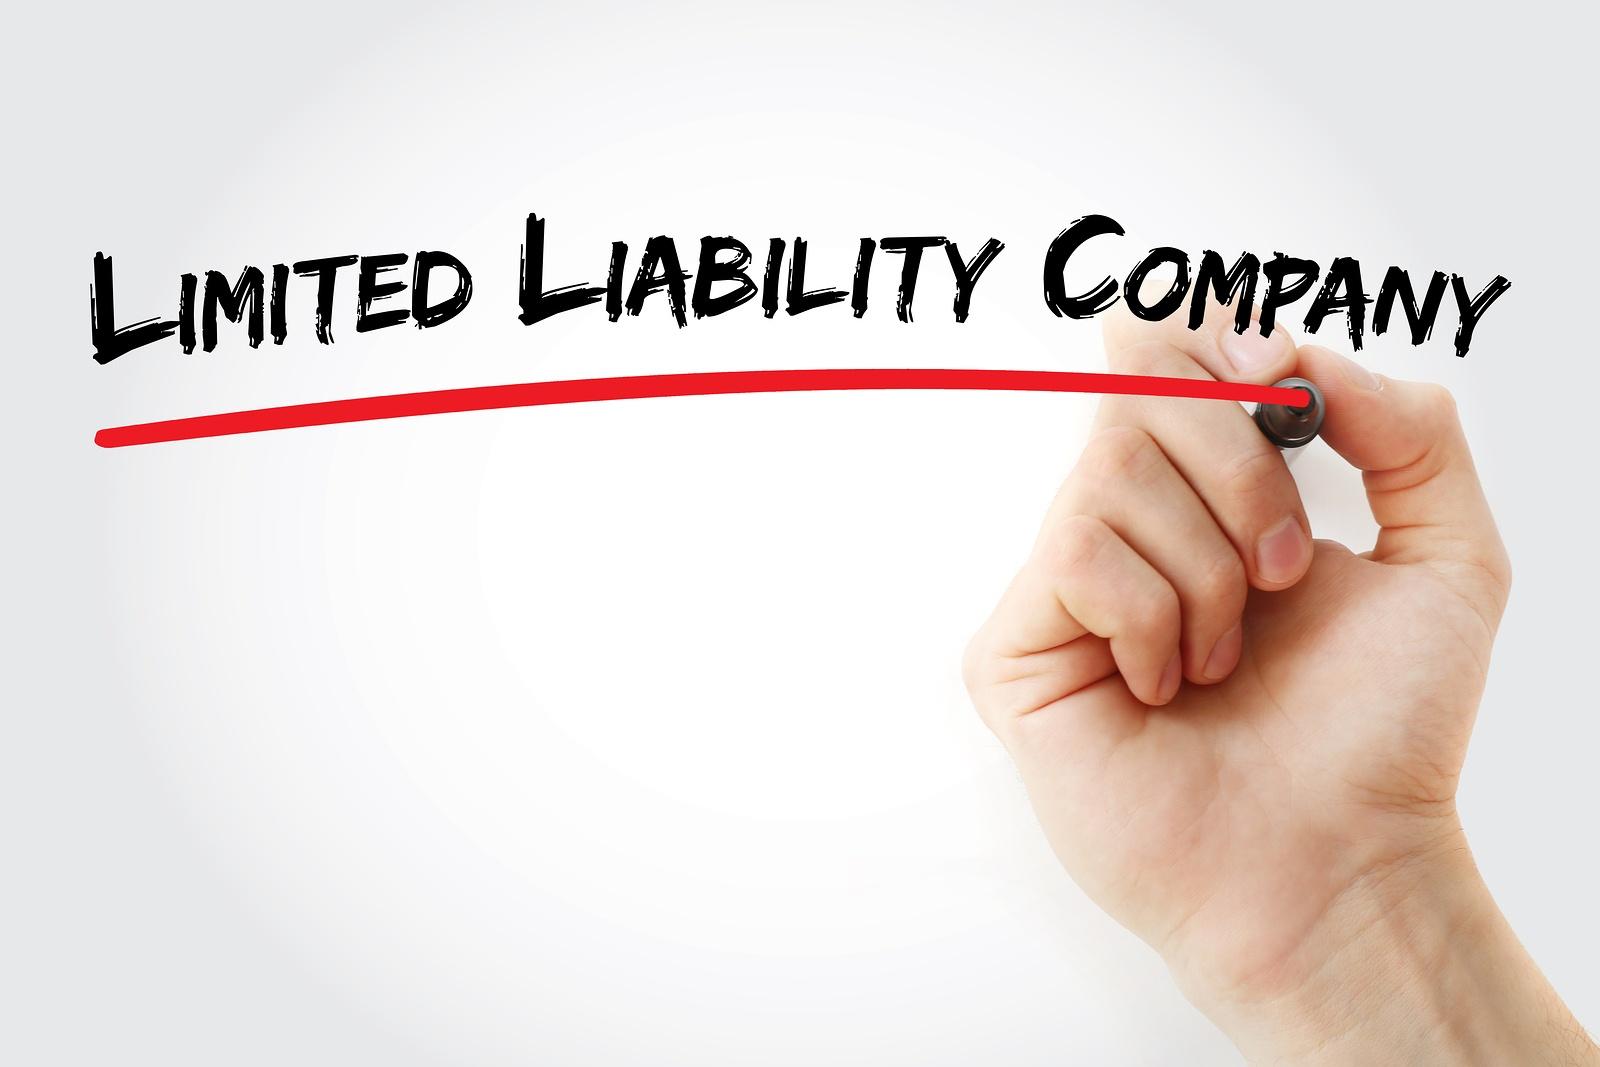 limitedliabilitycompany.jpg